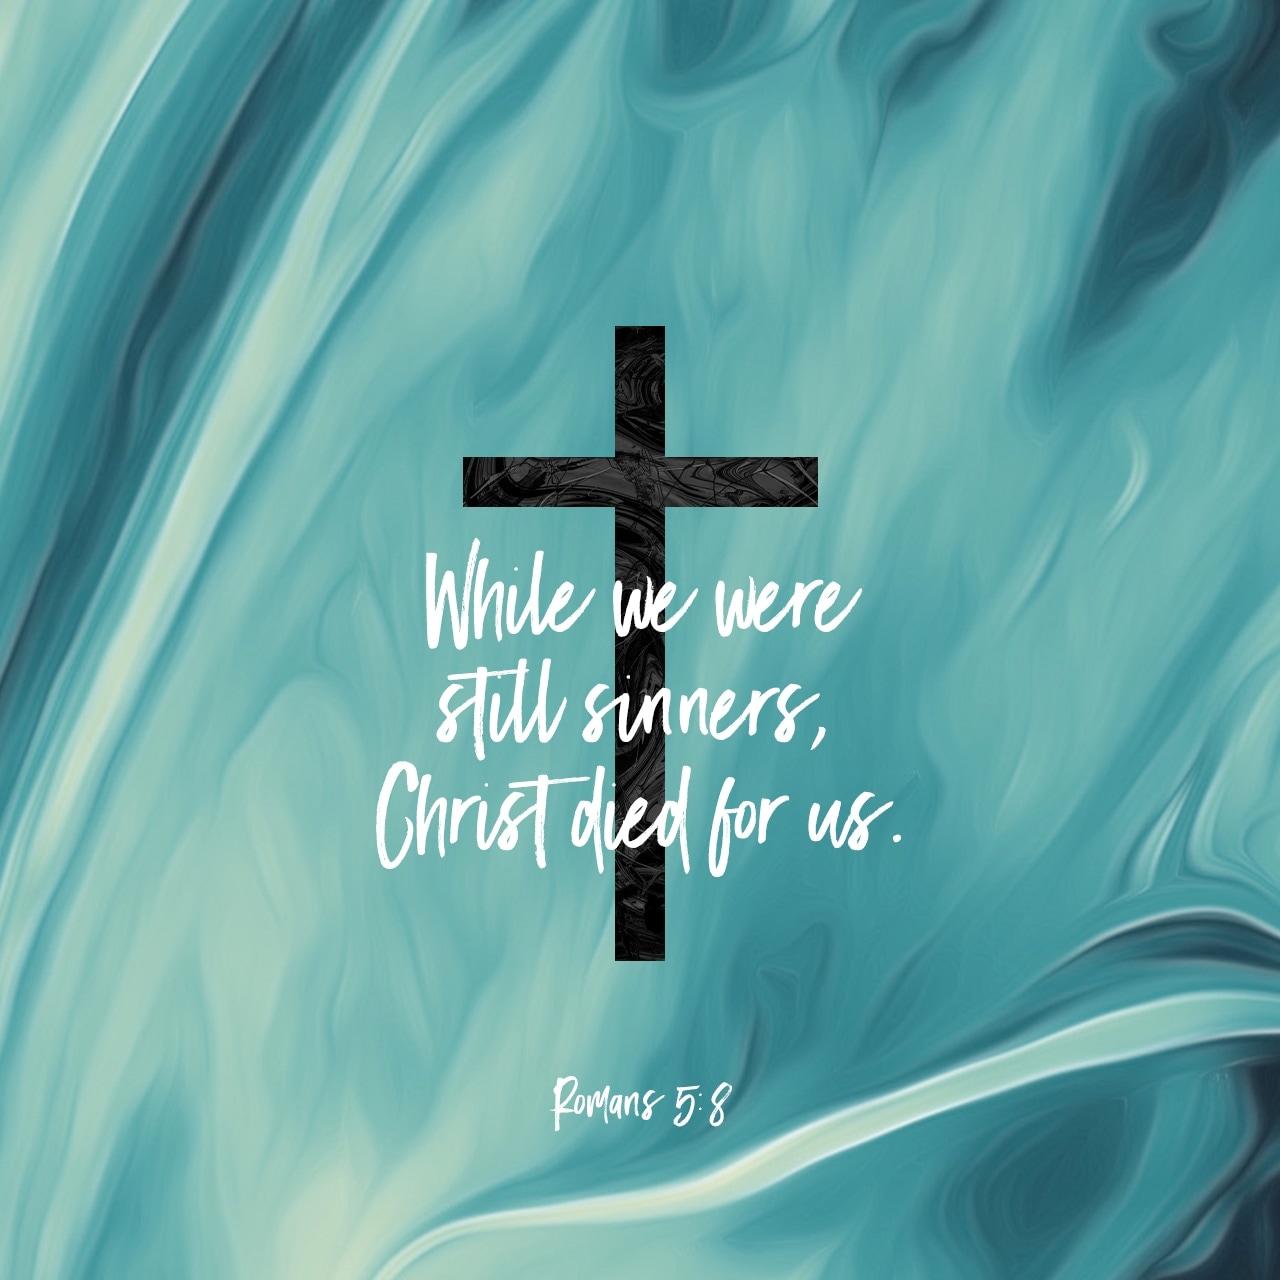 Romans 5:8 Verse Image